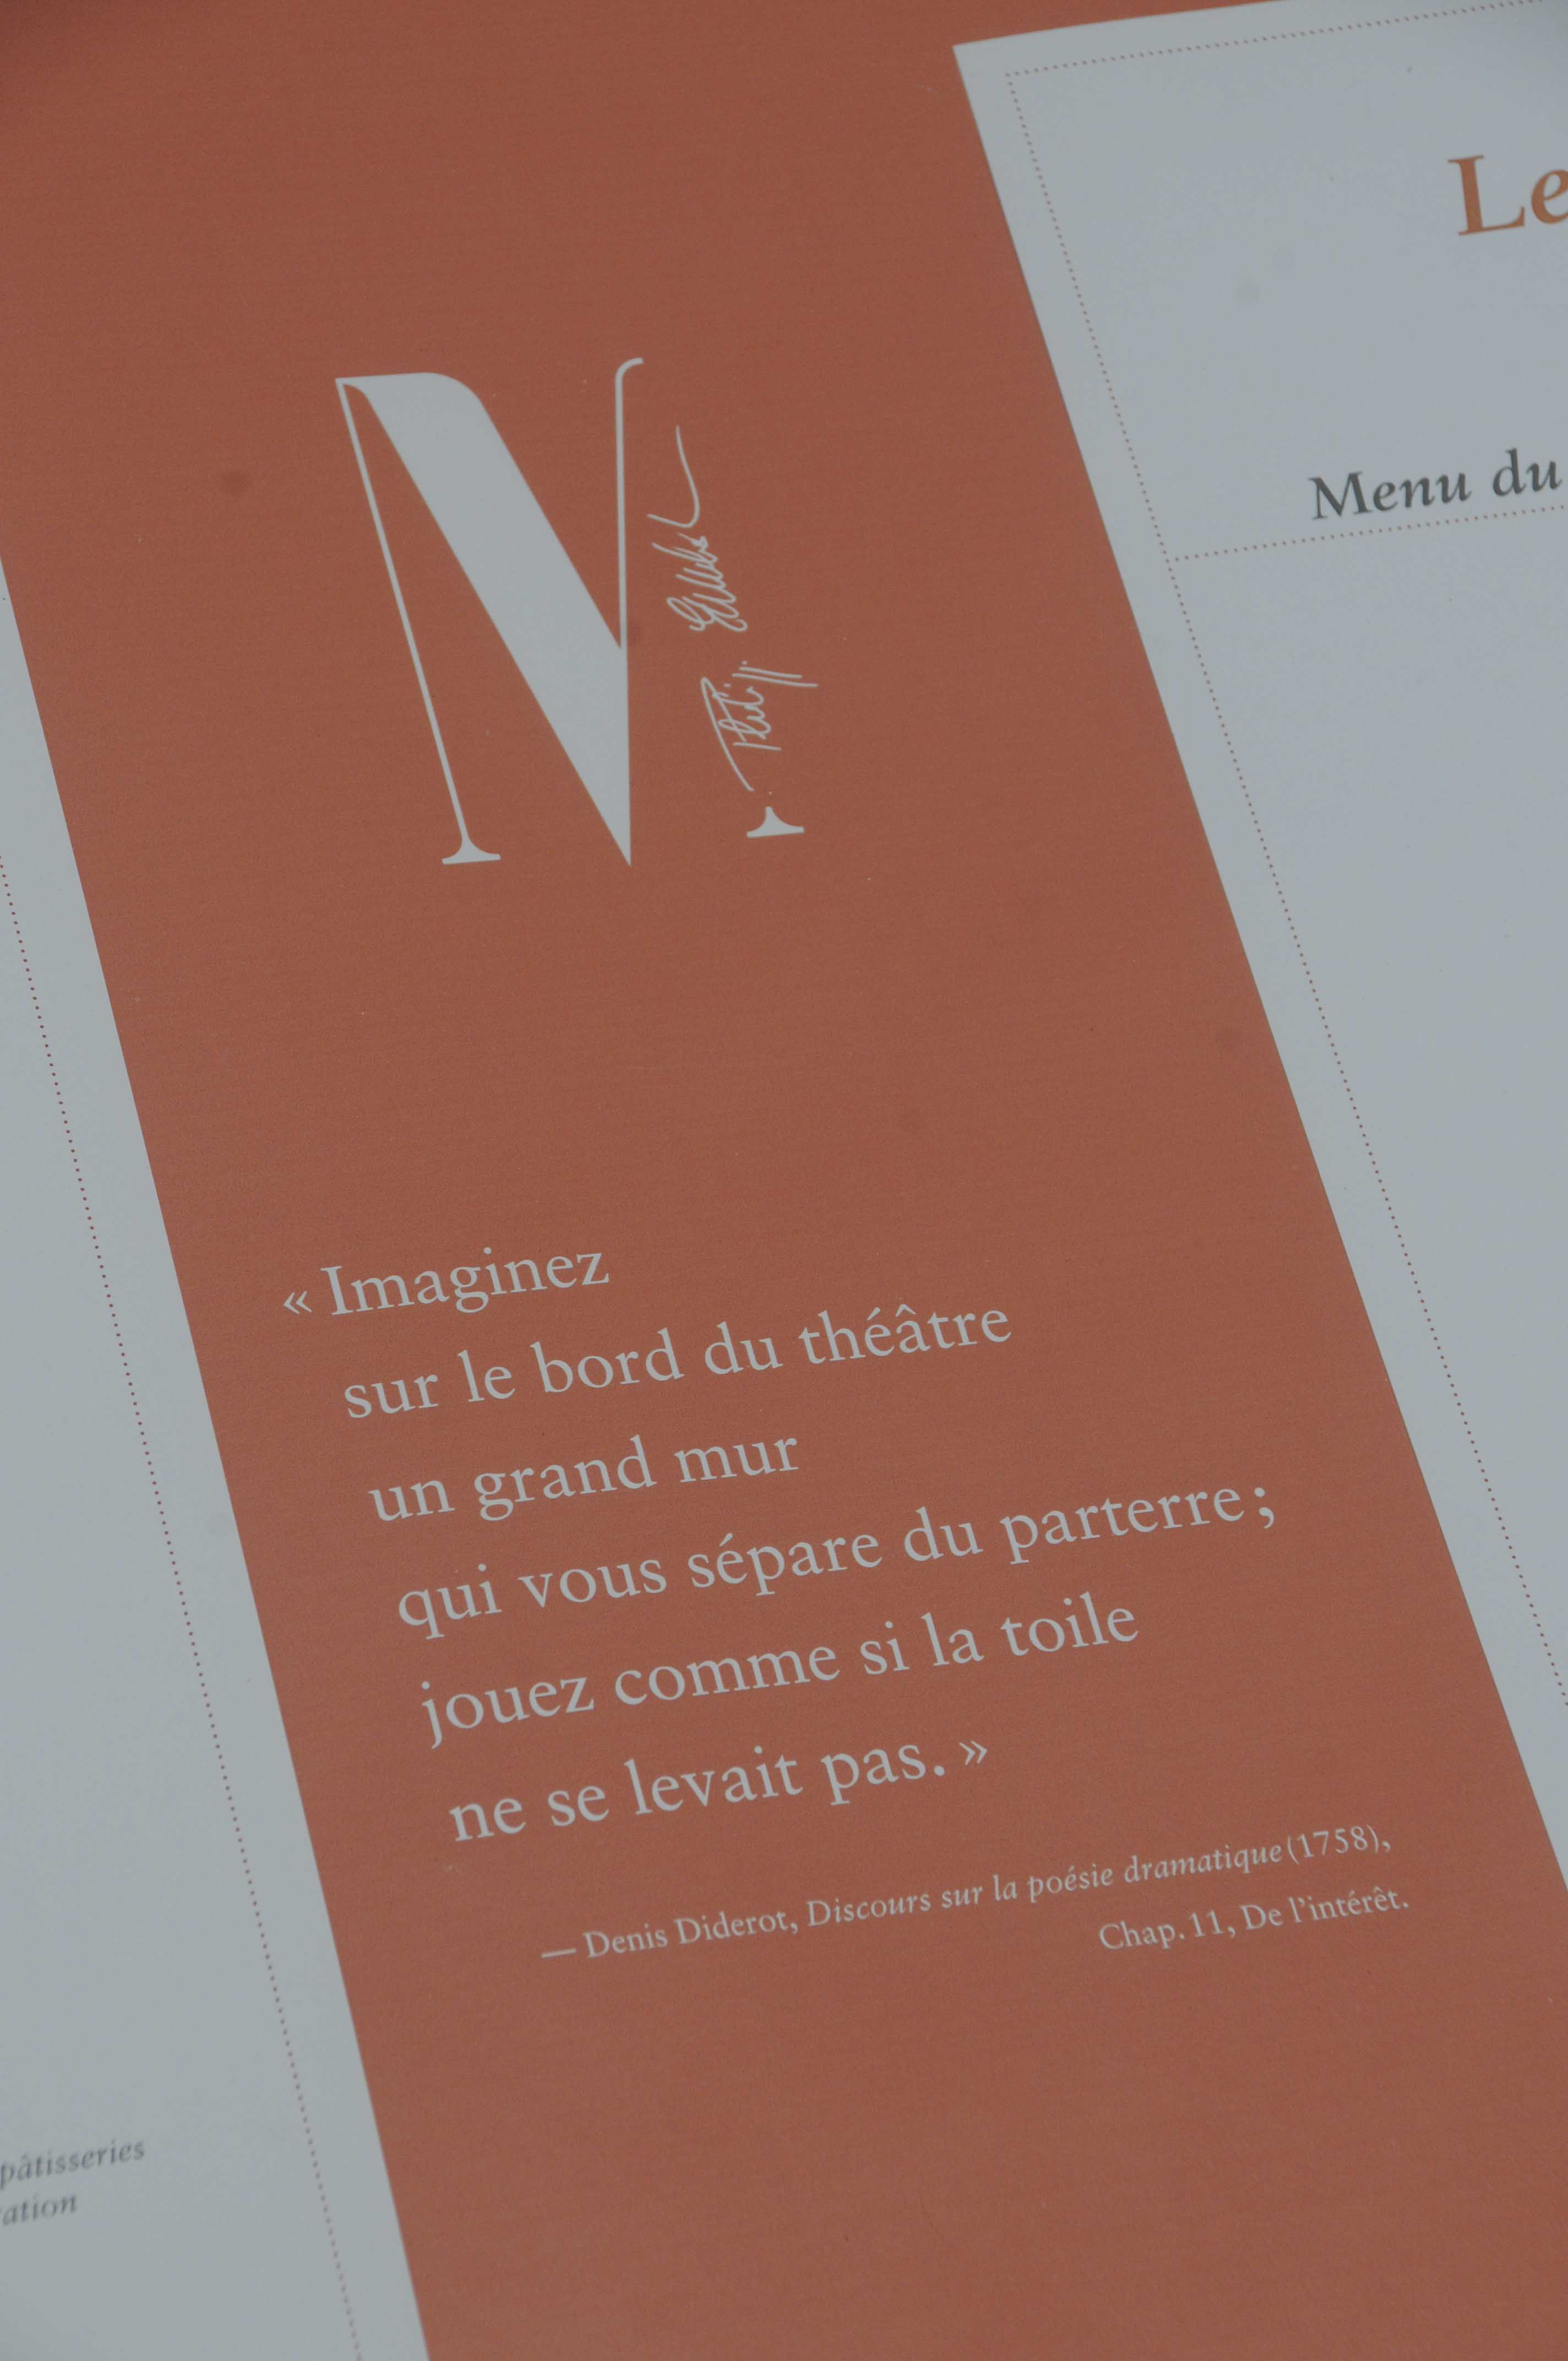 Restaurant Le Quatri Ef Bf Bdme Mur Menu Et Prix